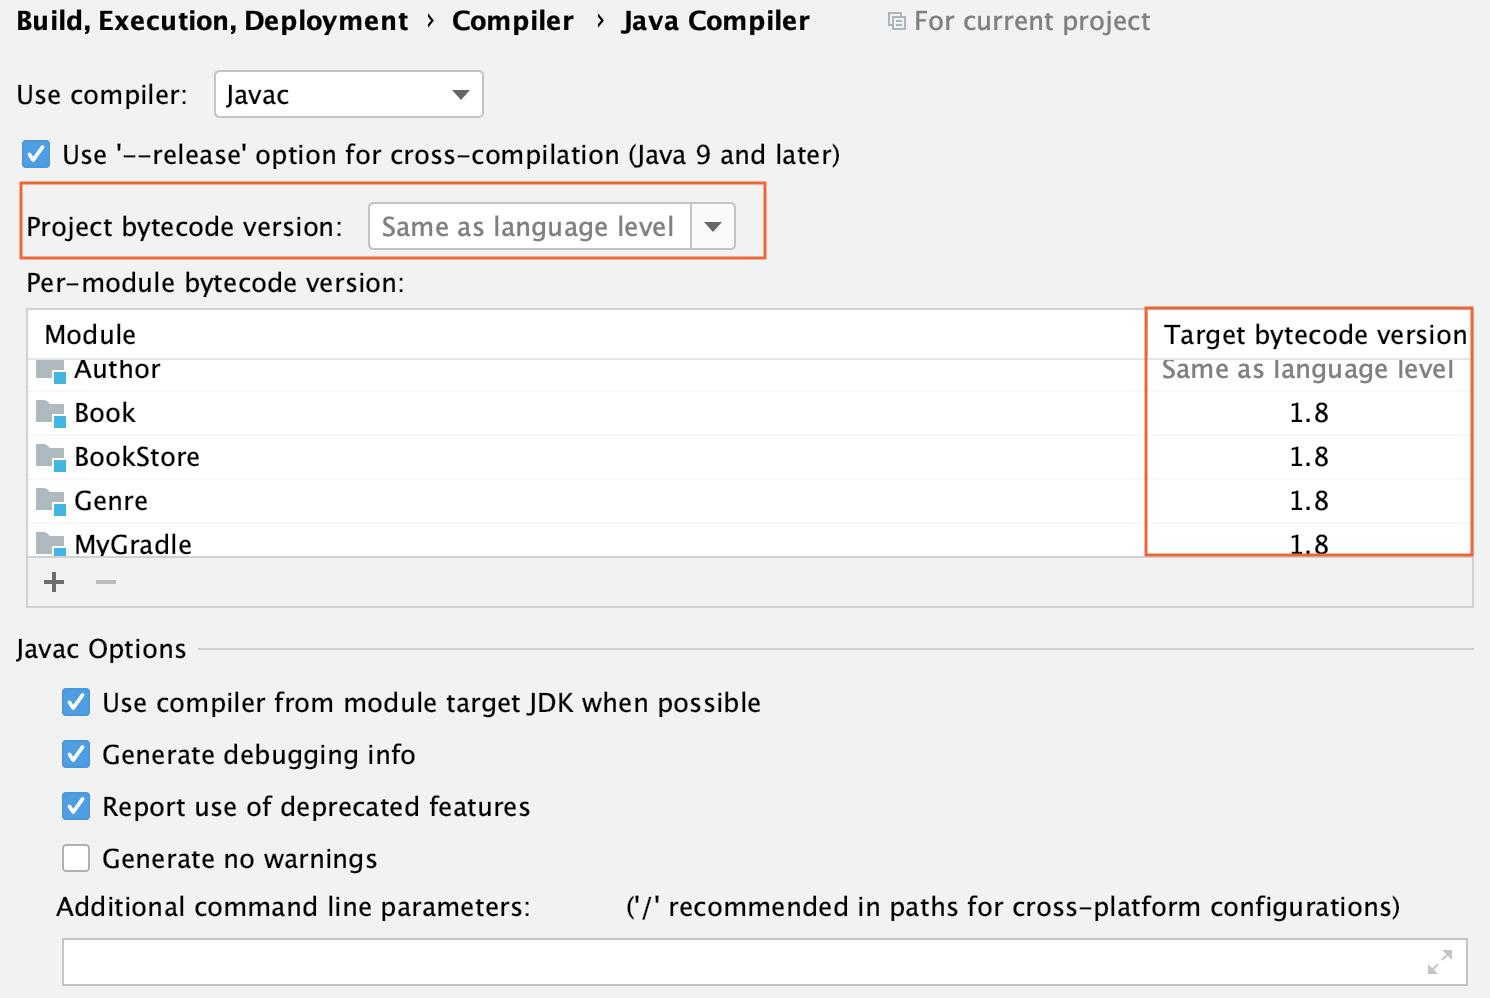 the Java compiler settings